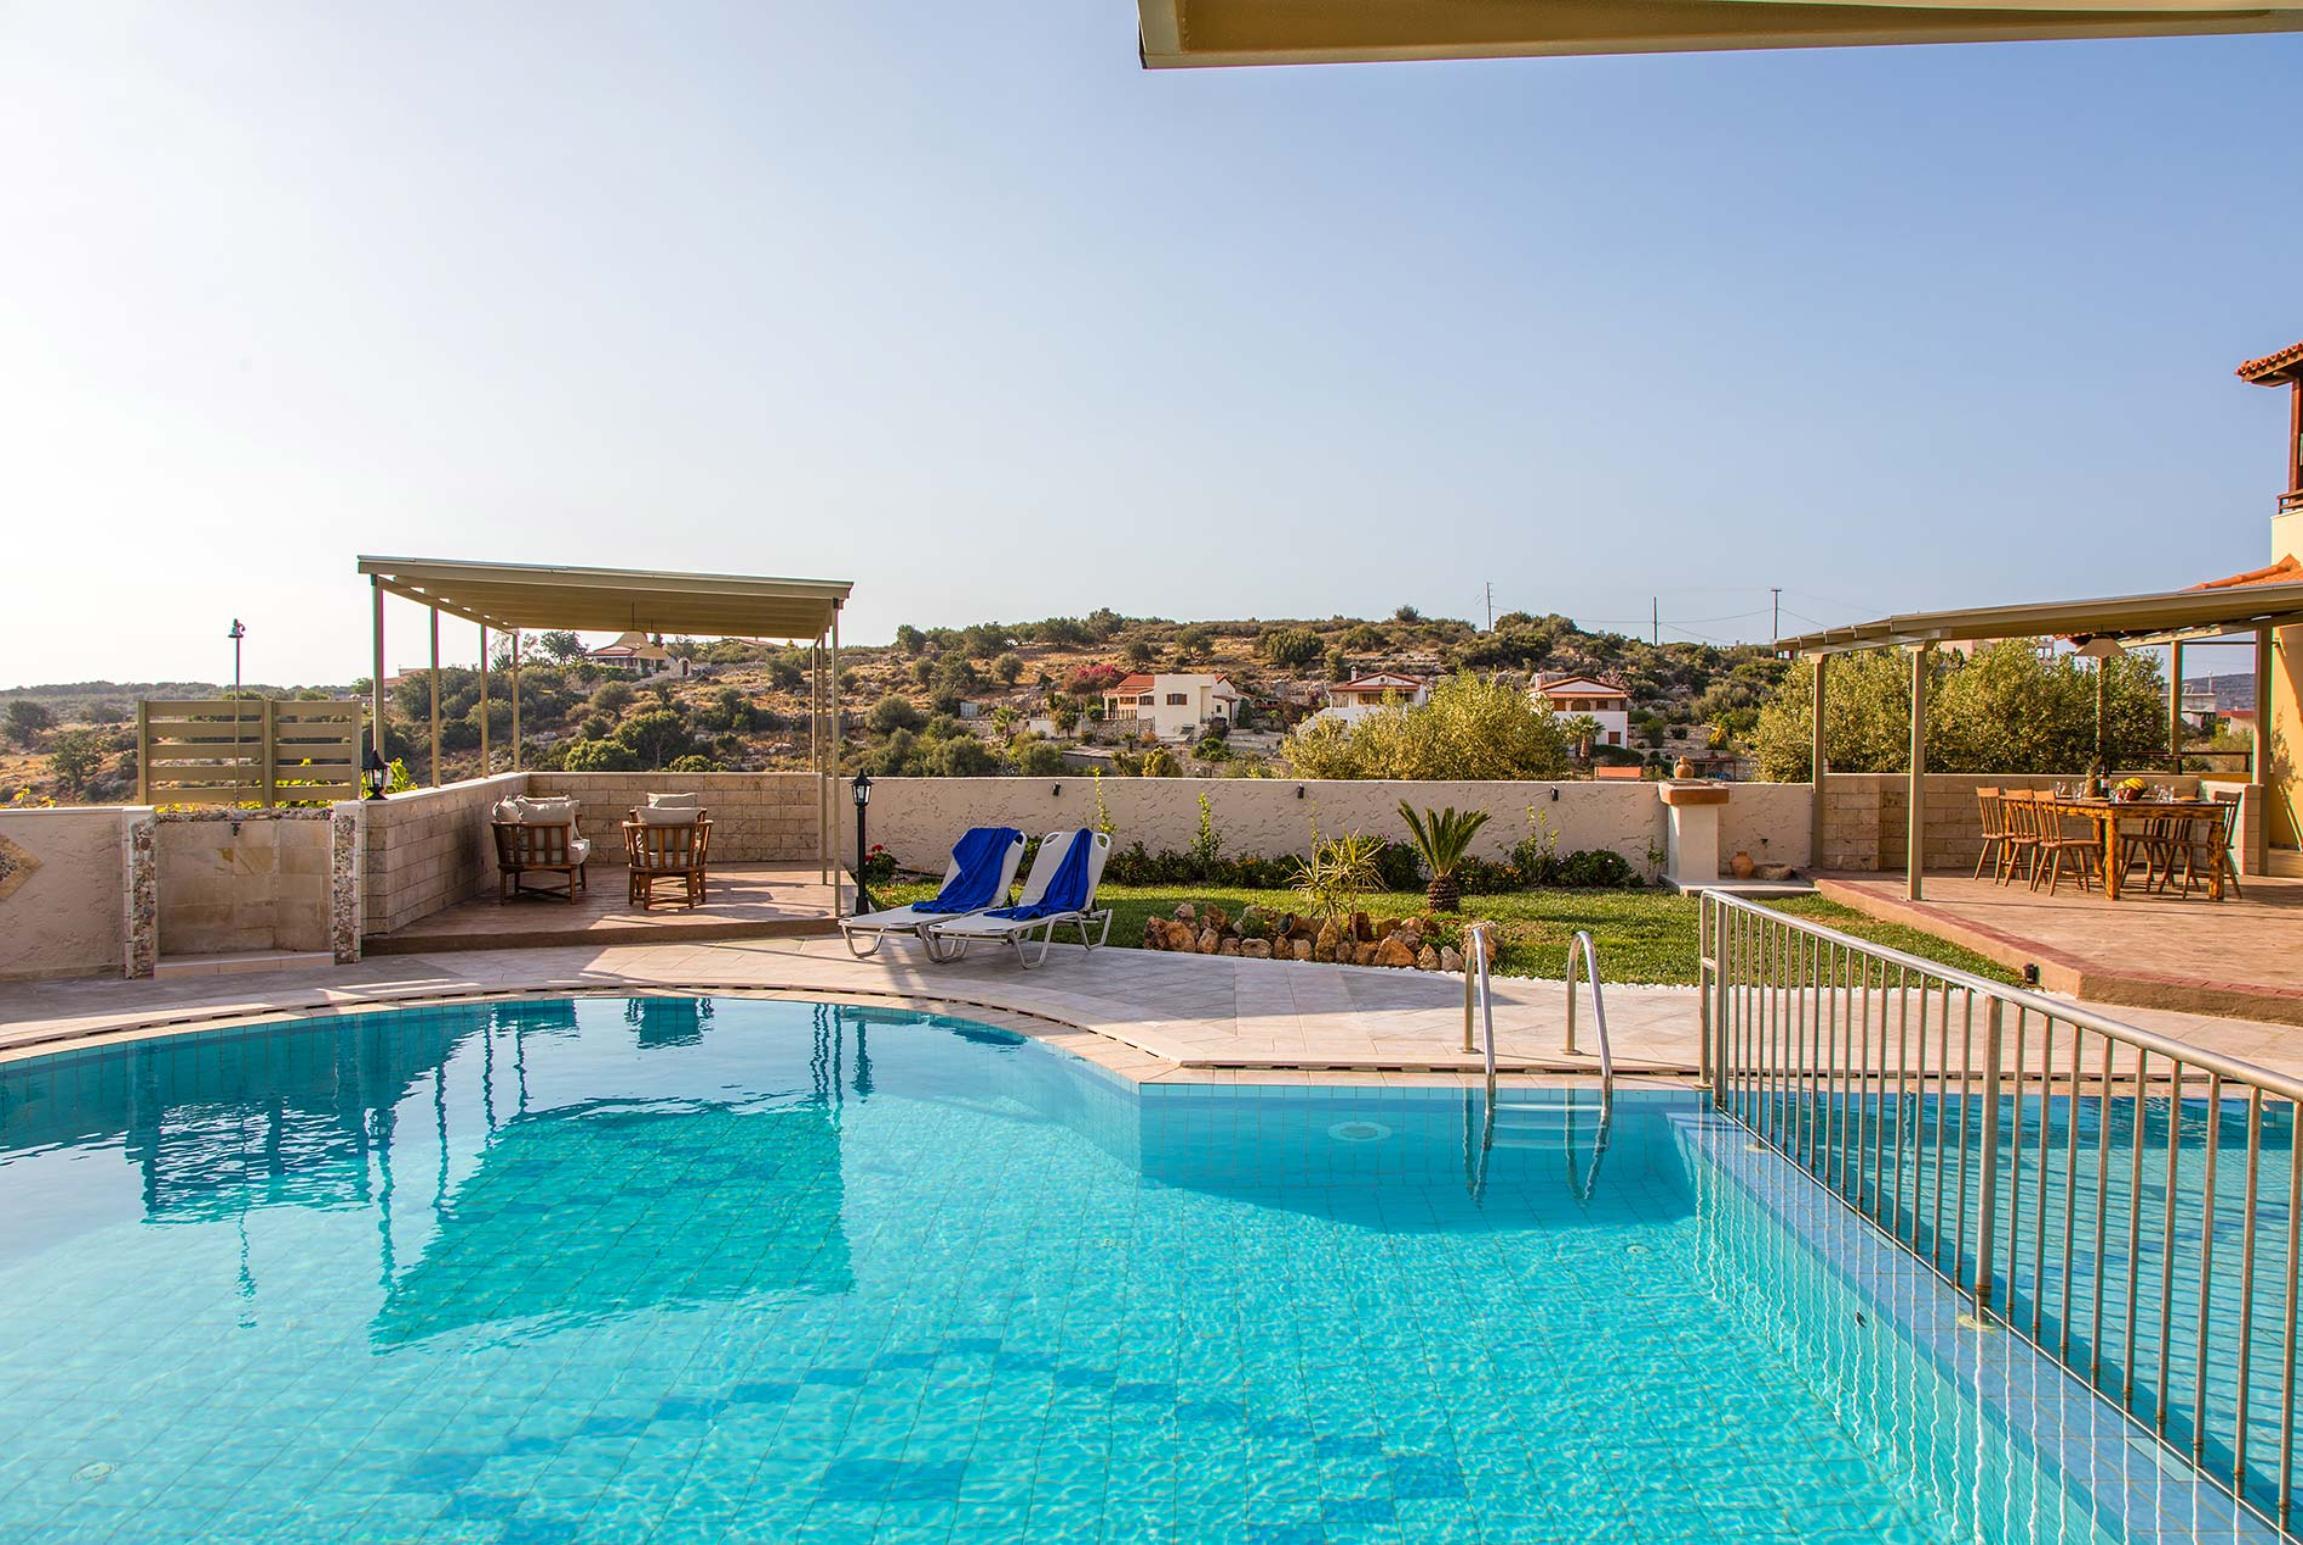 Ferienhaus Dina (2653758), Roumeli, Kreta Nordküste, Kreta, Griechenland, Bild 26